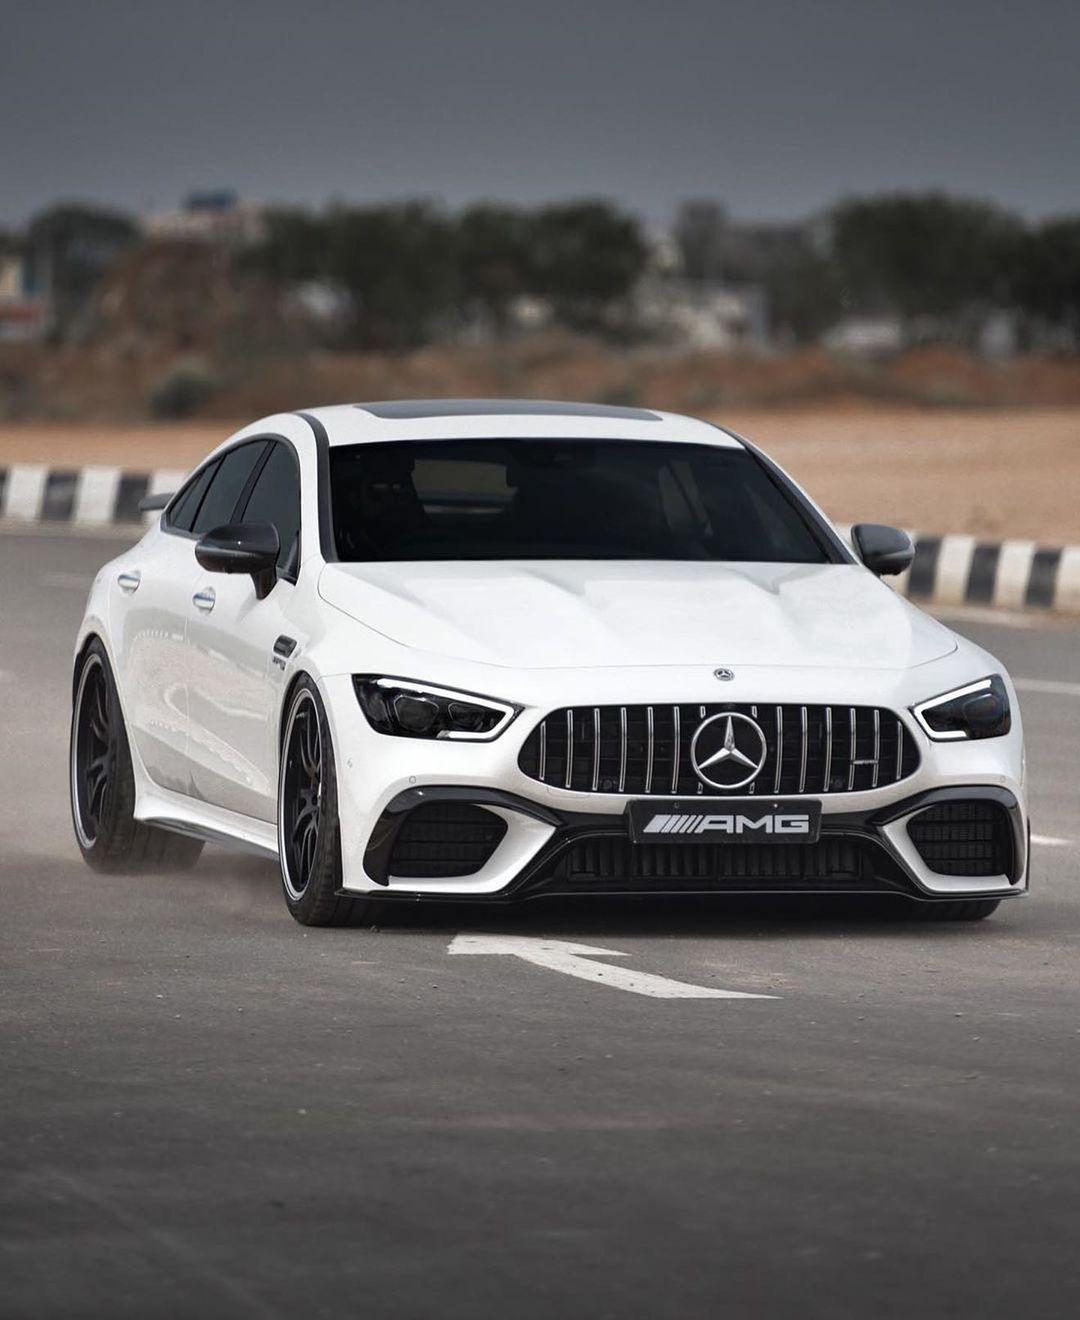 32+ Fastest 4 door sedan ideas in 2021